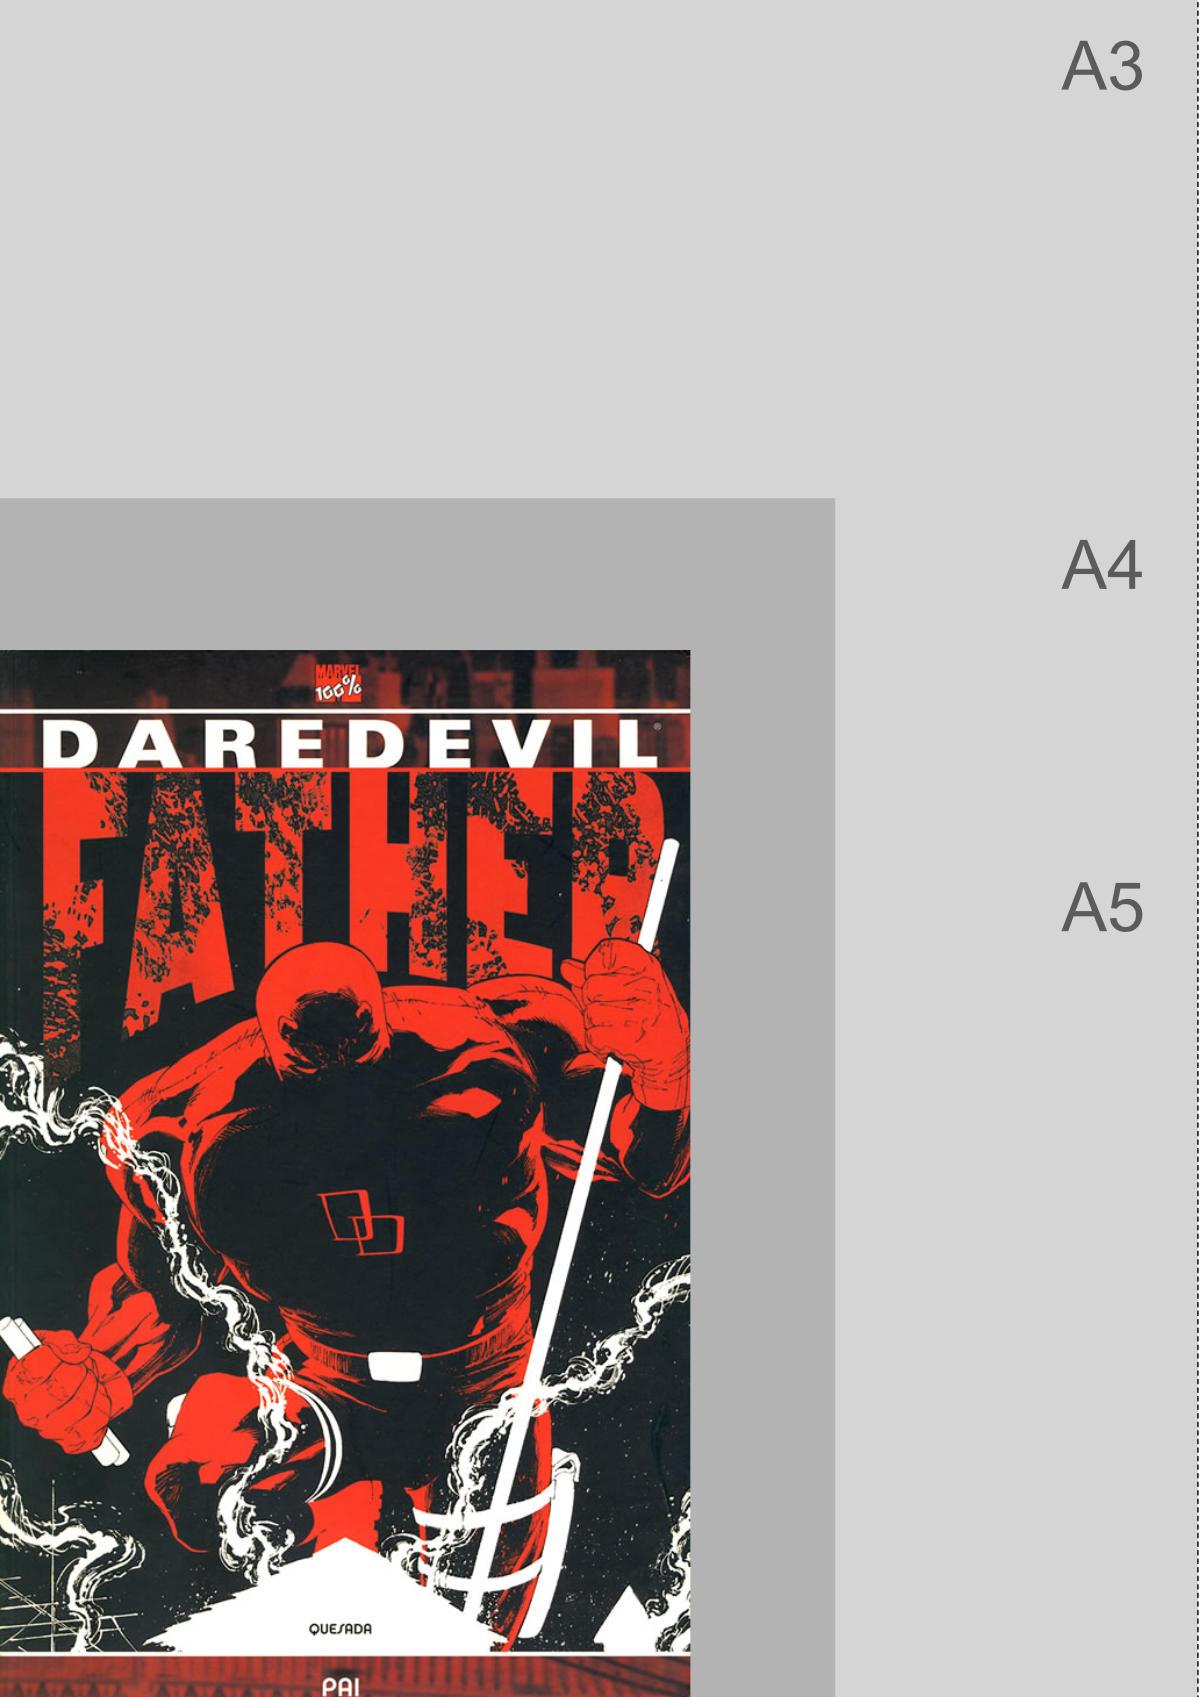 DAREDEVIL: PAI